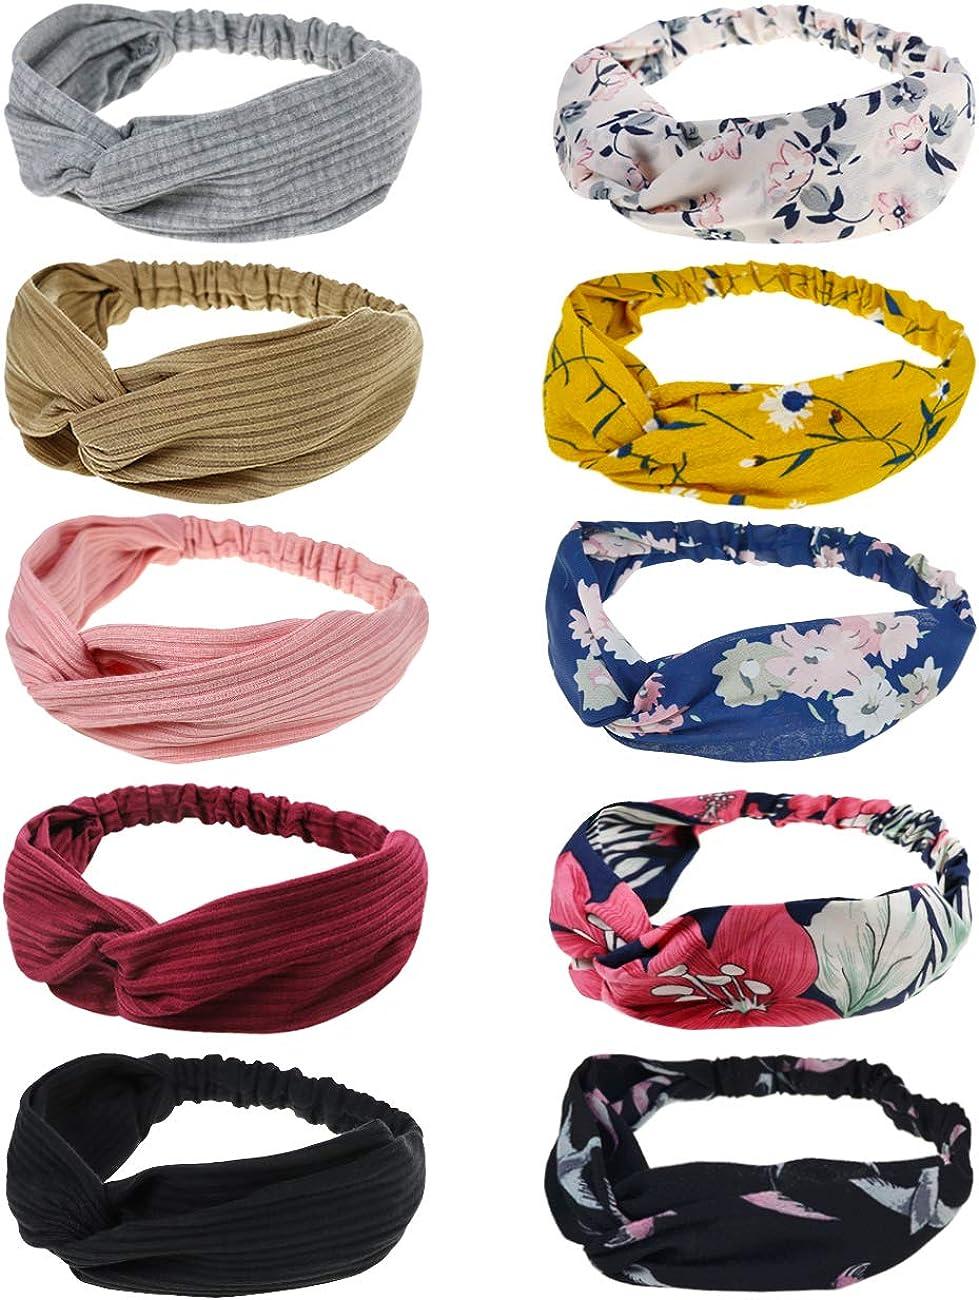 DRESHOW 10 PCS Boho Diademas para Mujeres Flor Vintage Impreso Criss Cross Anudado Elástico Banda para el Cabello Stretchy Head Wrap Twisted Accesorios